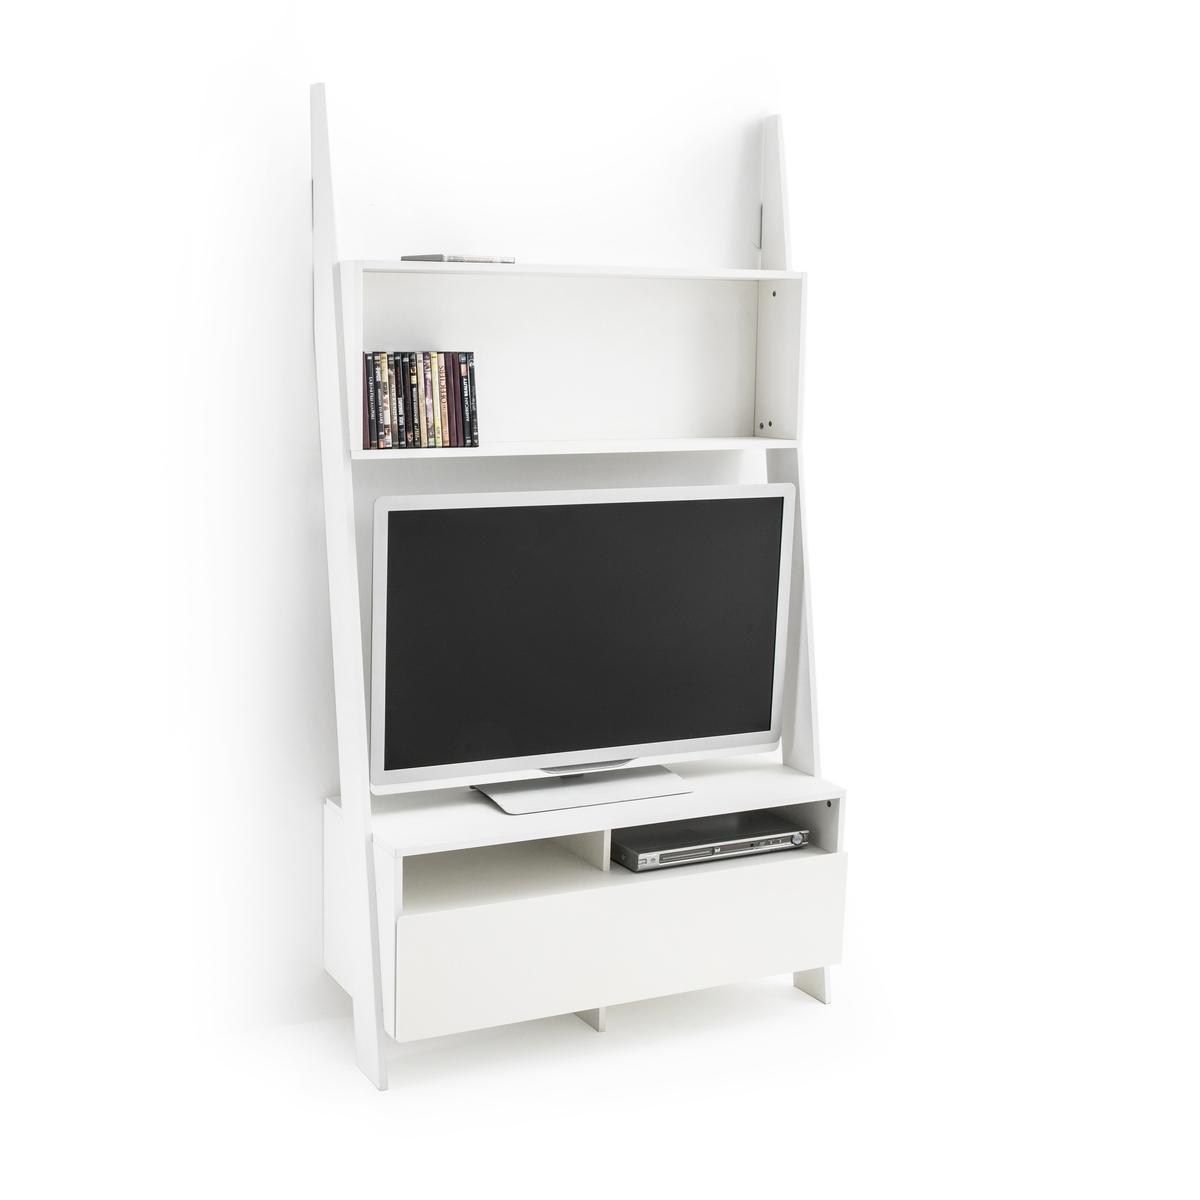 Тумба-лестница LaRedoute Для телевизора Domeno единый размер белый